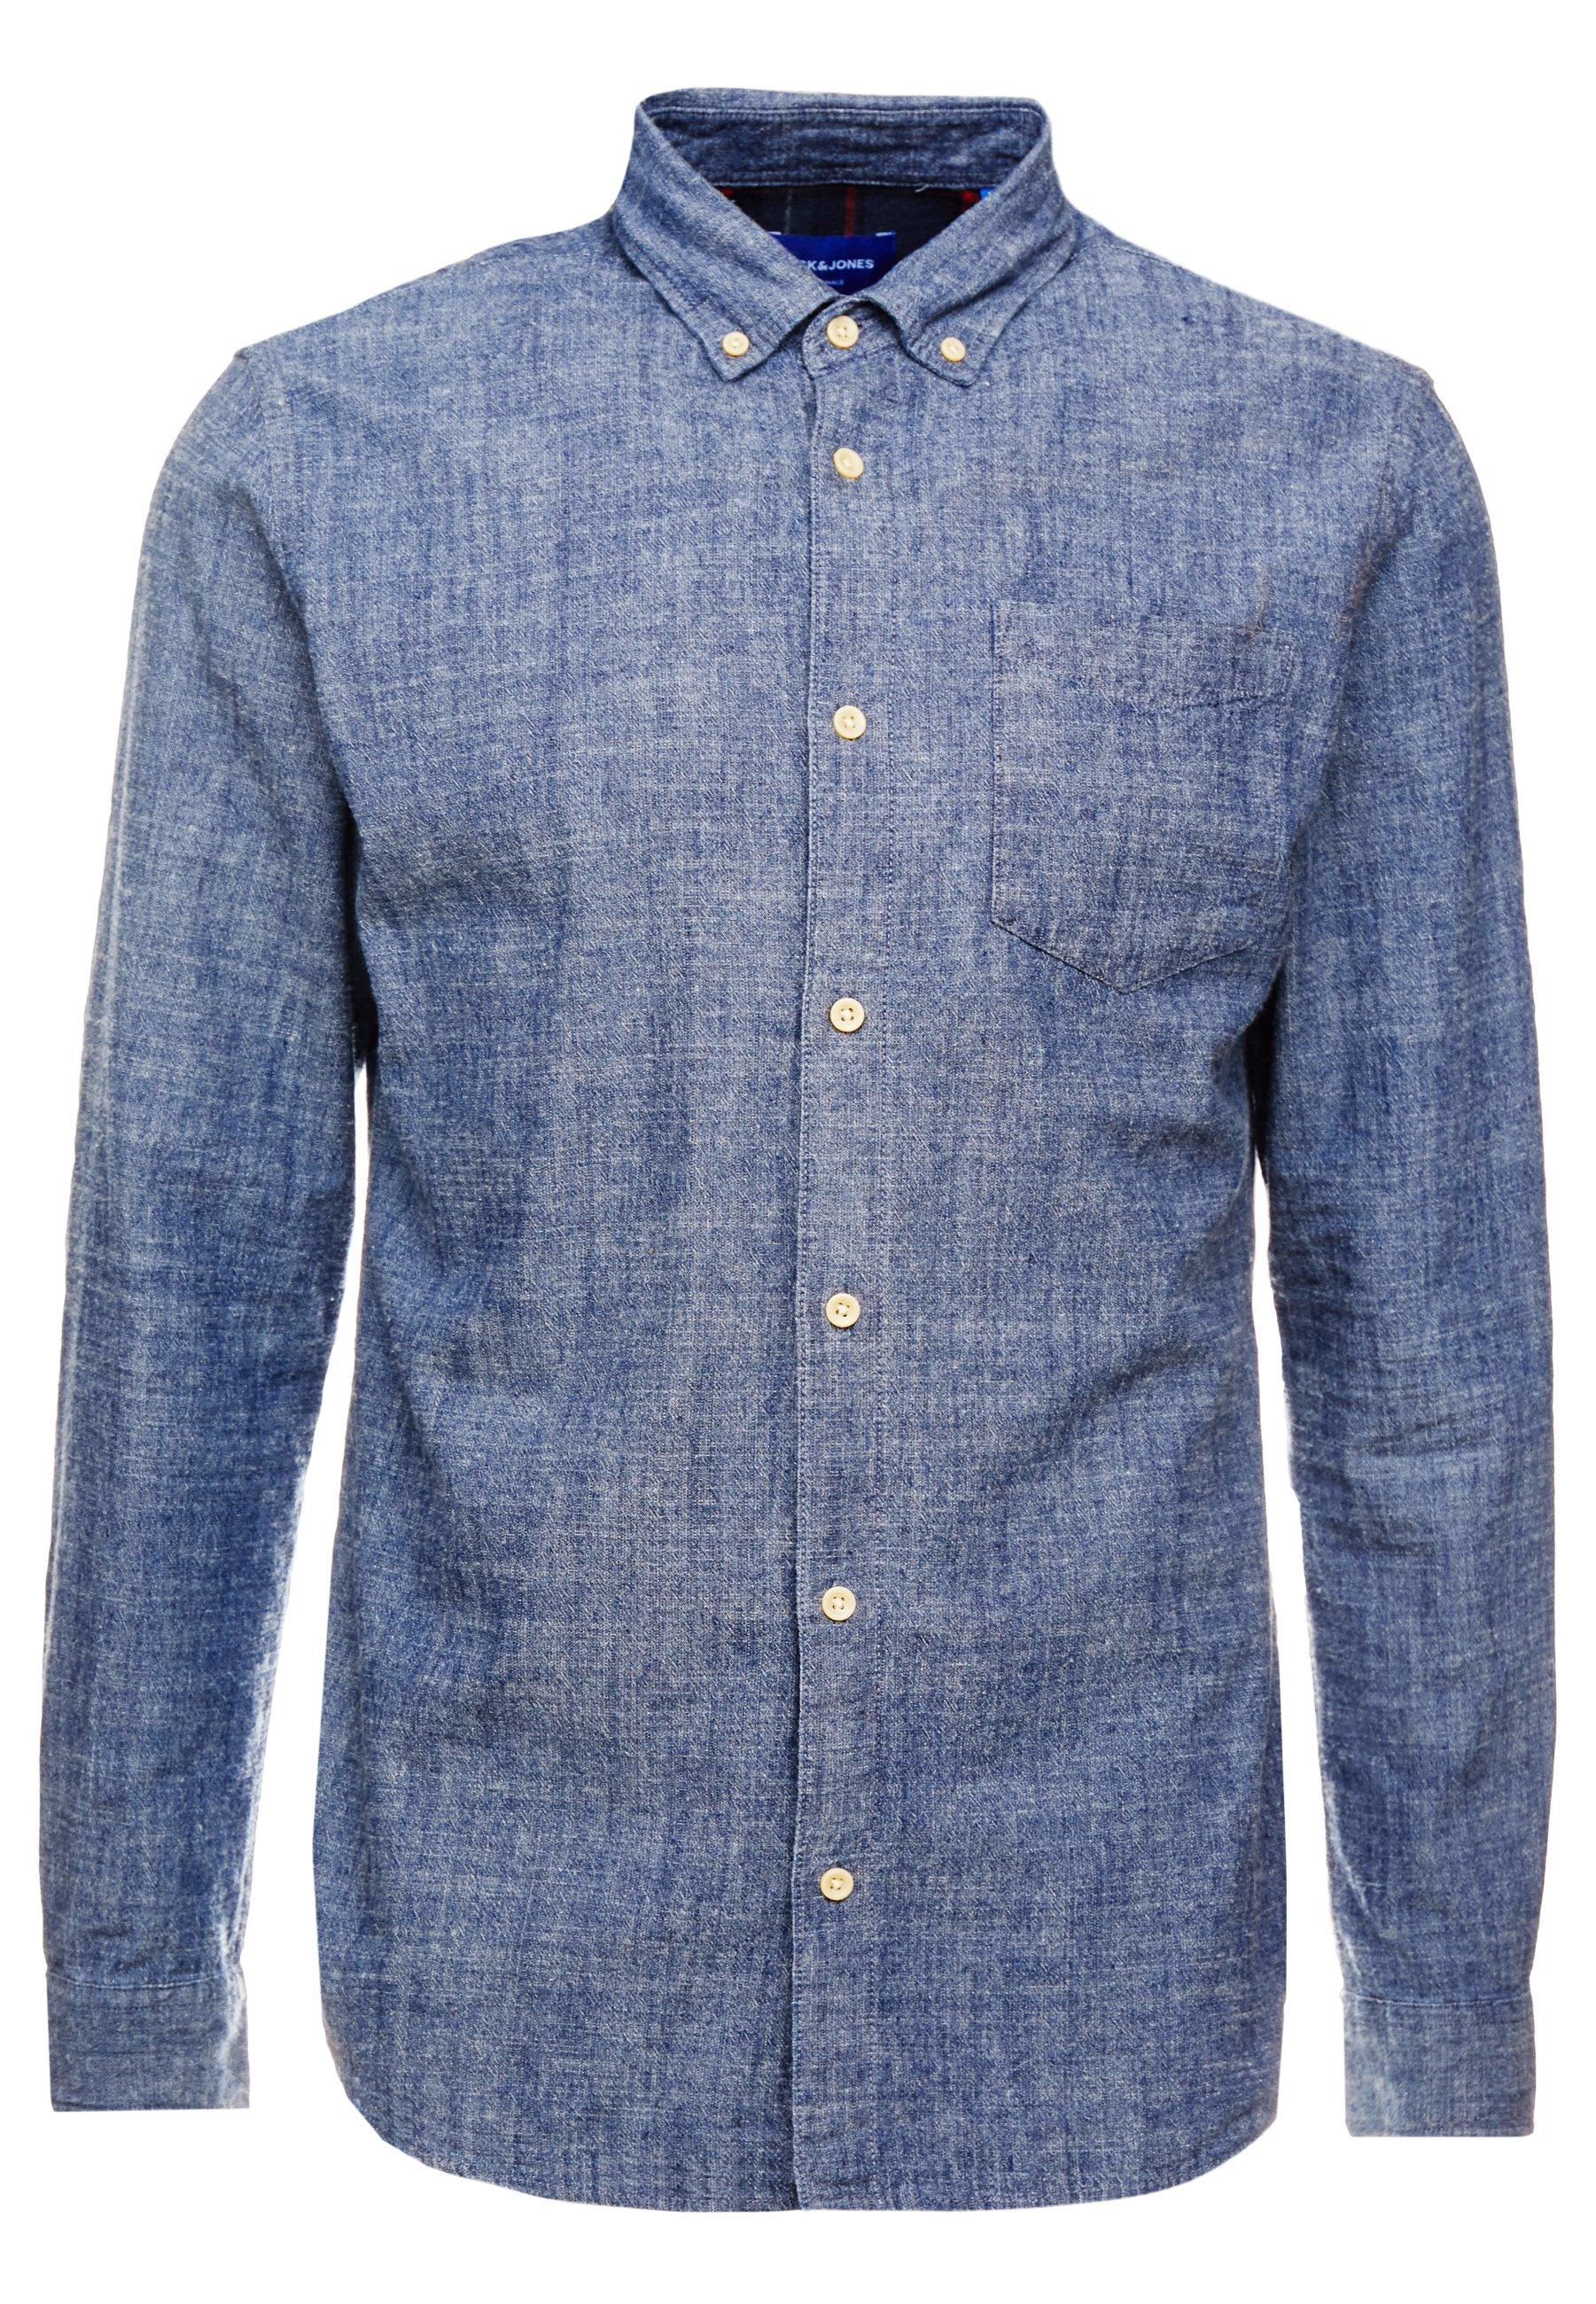 Jack & Jones Jorrick Slim Fit - Skjorta Navy Blazer